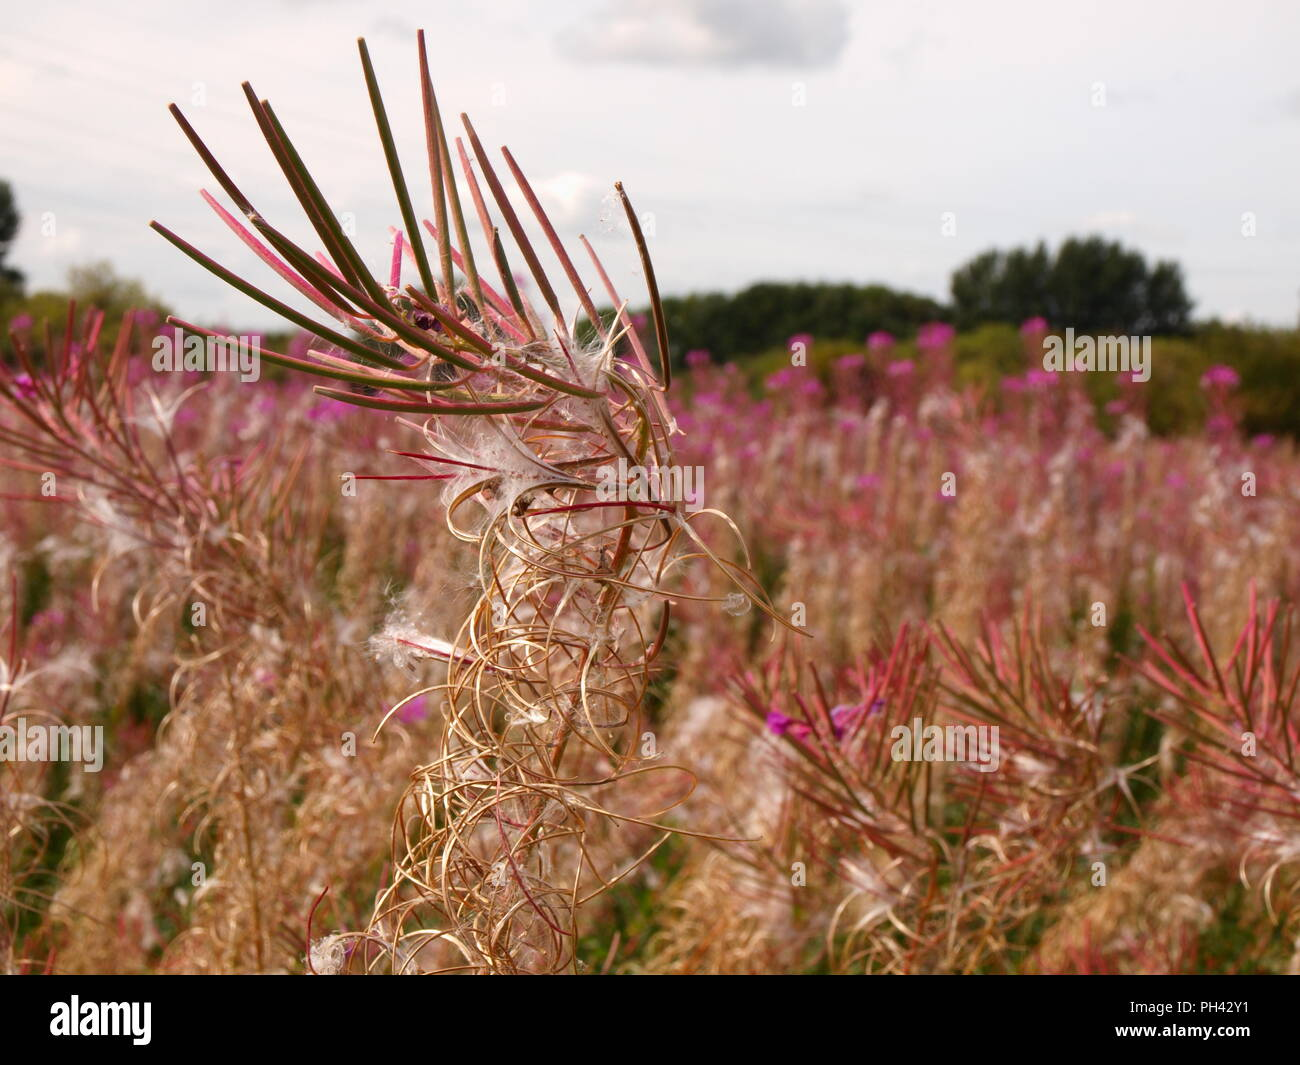 charmaenerion angustifolium fireweed rosebay willowherb shot in chorlton meadows manchester england in august Stock Photo